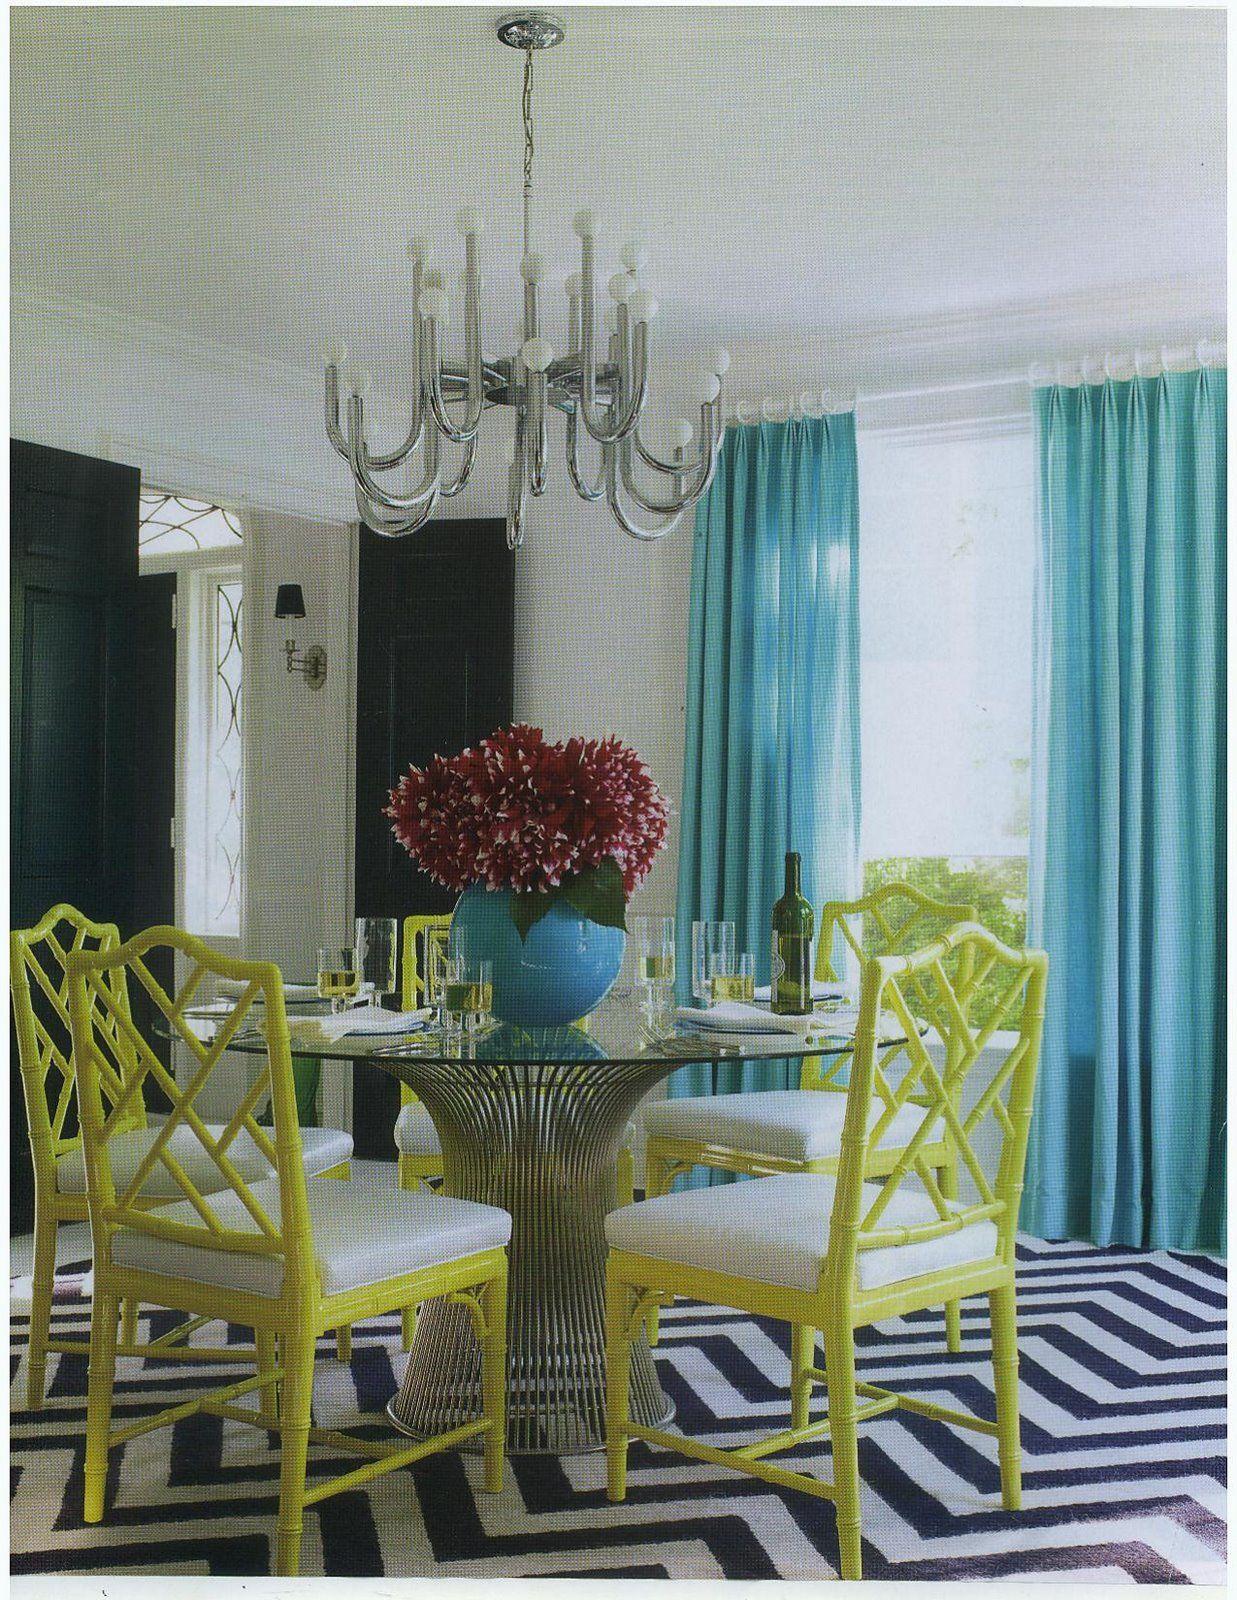 pops of color throughout | Interior Design | Pinterest | Teal ...